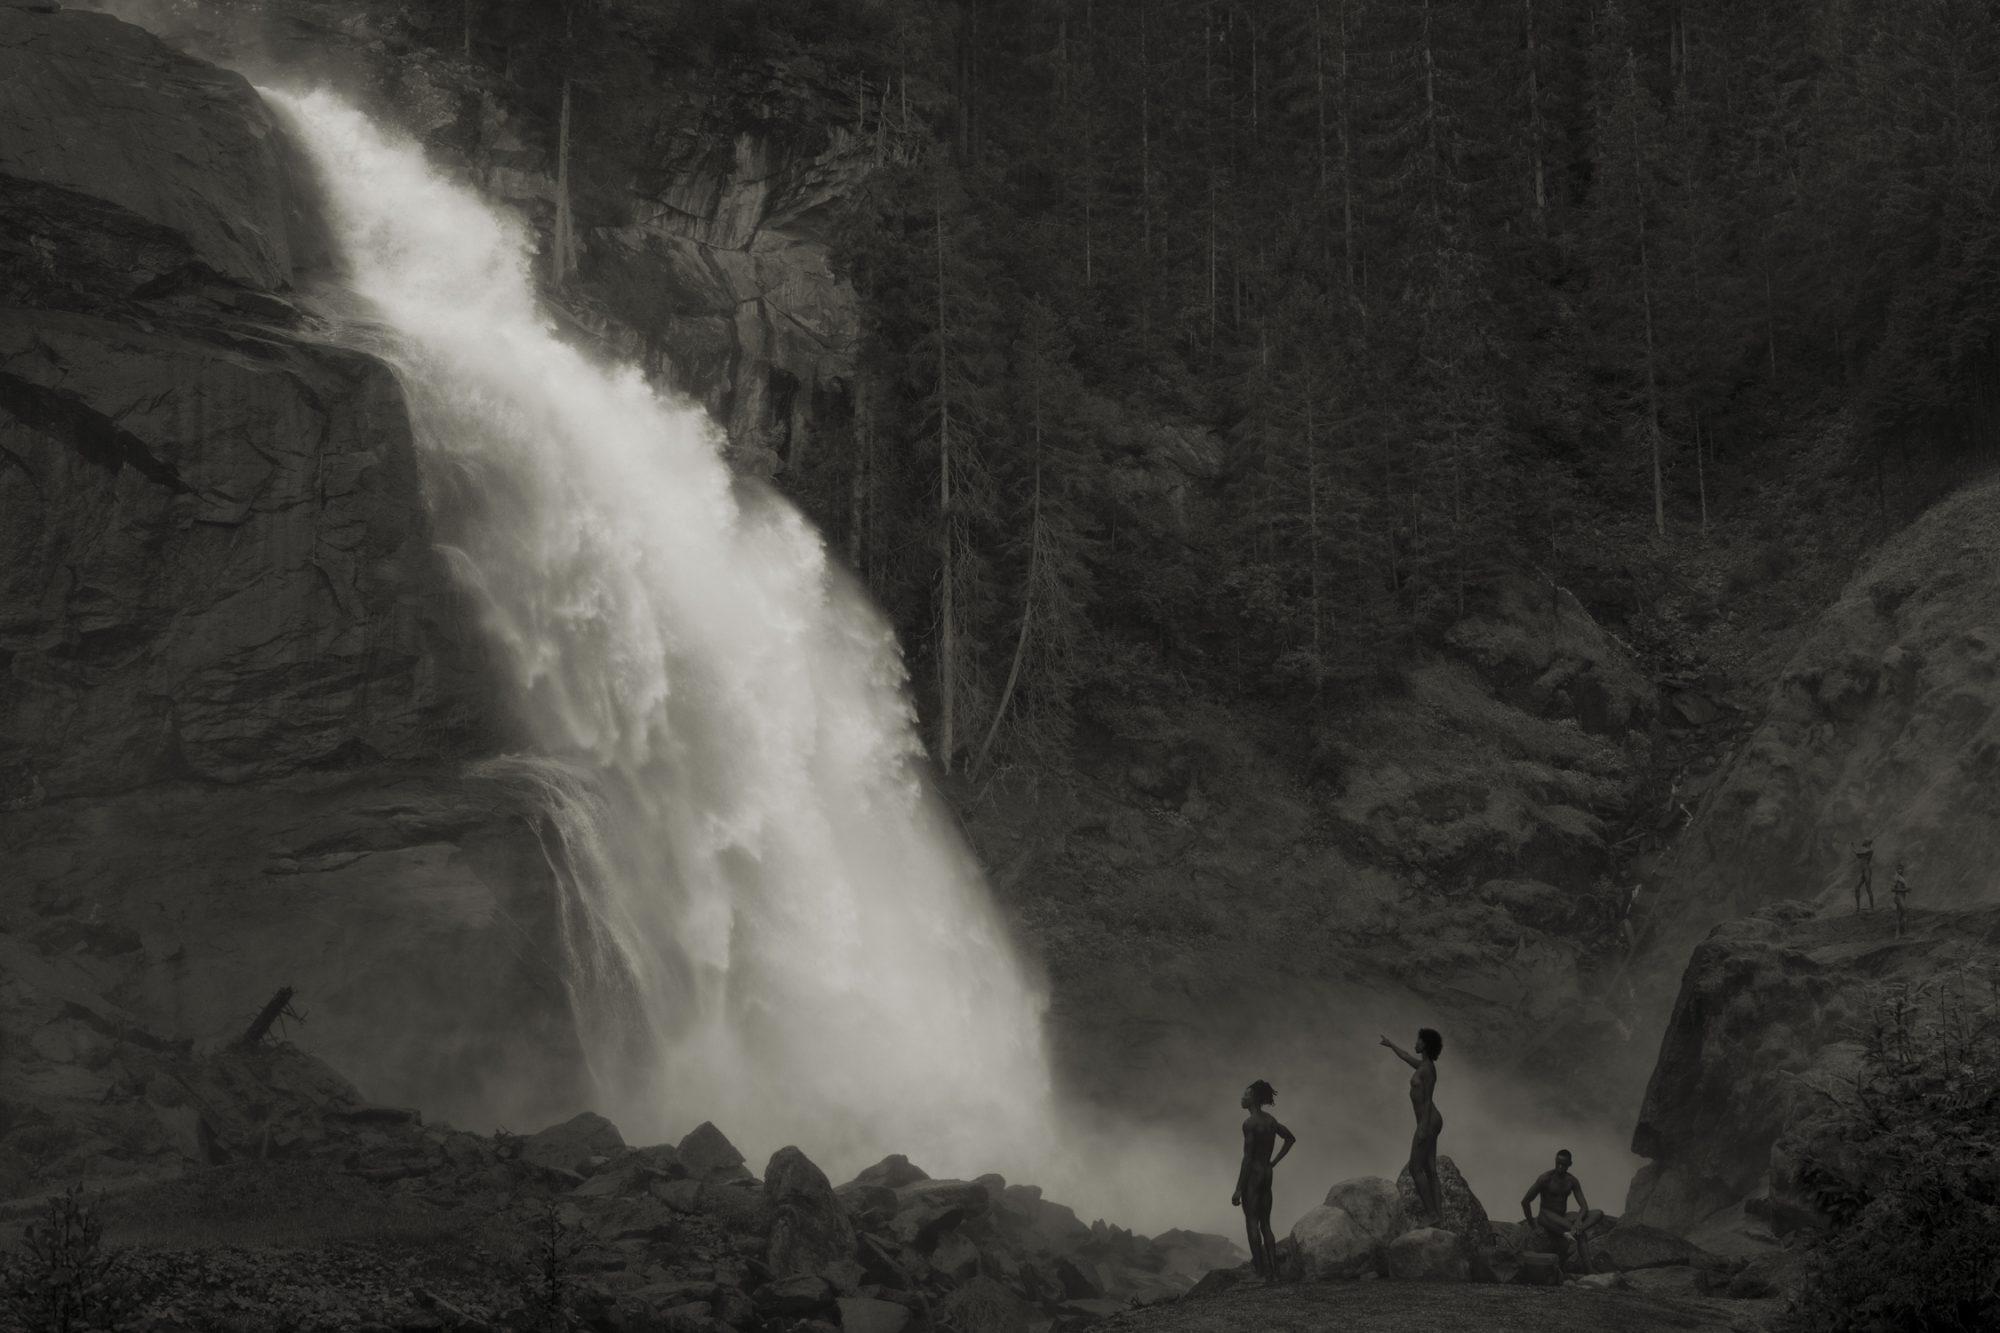 Opening Soon: Erwin Olaf | Im Wald